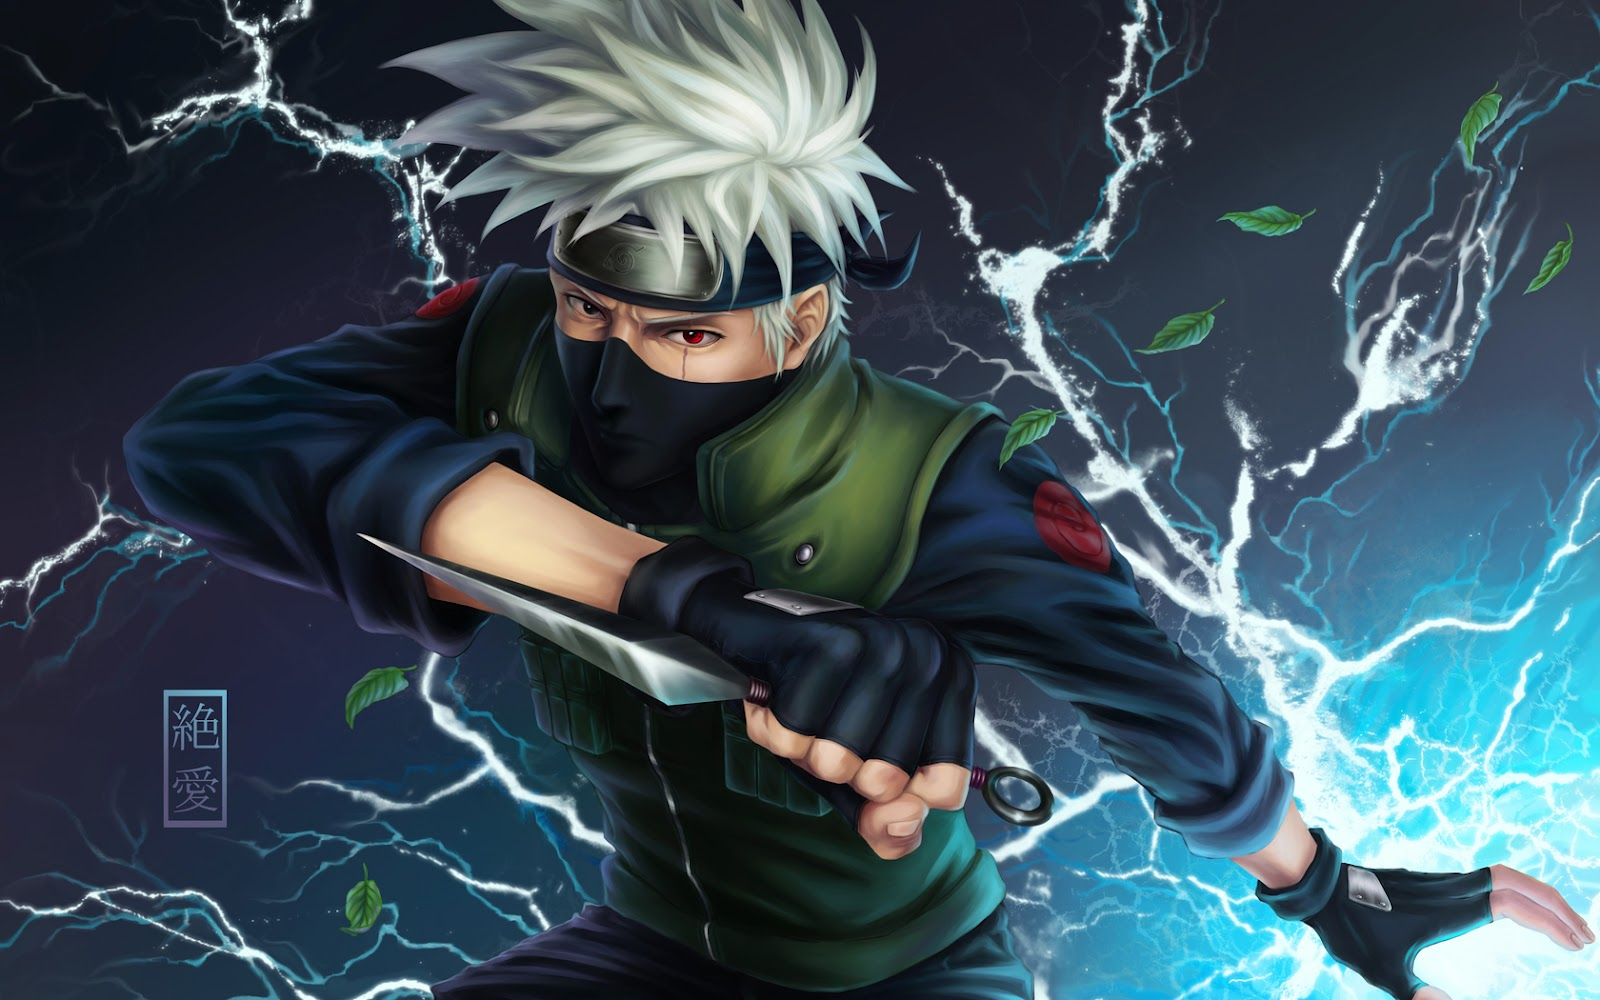 Naruto HD Wallpaper Naruto Shippuden Images 1600x1000